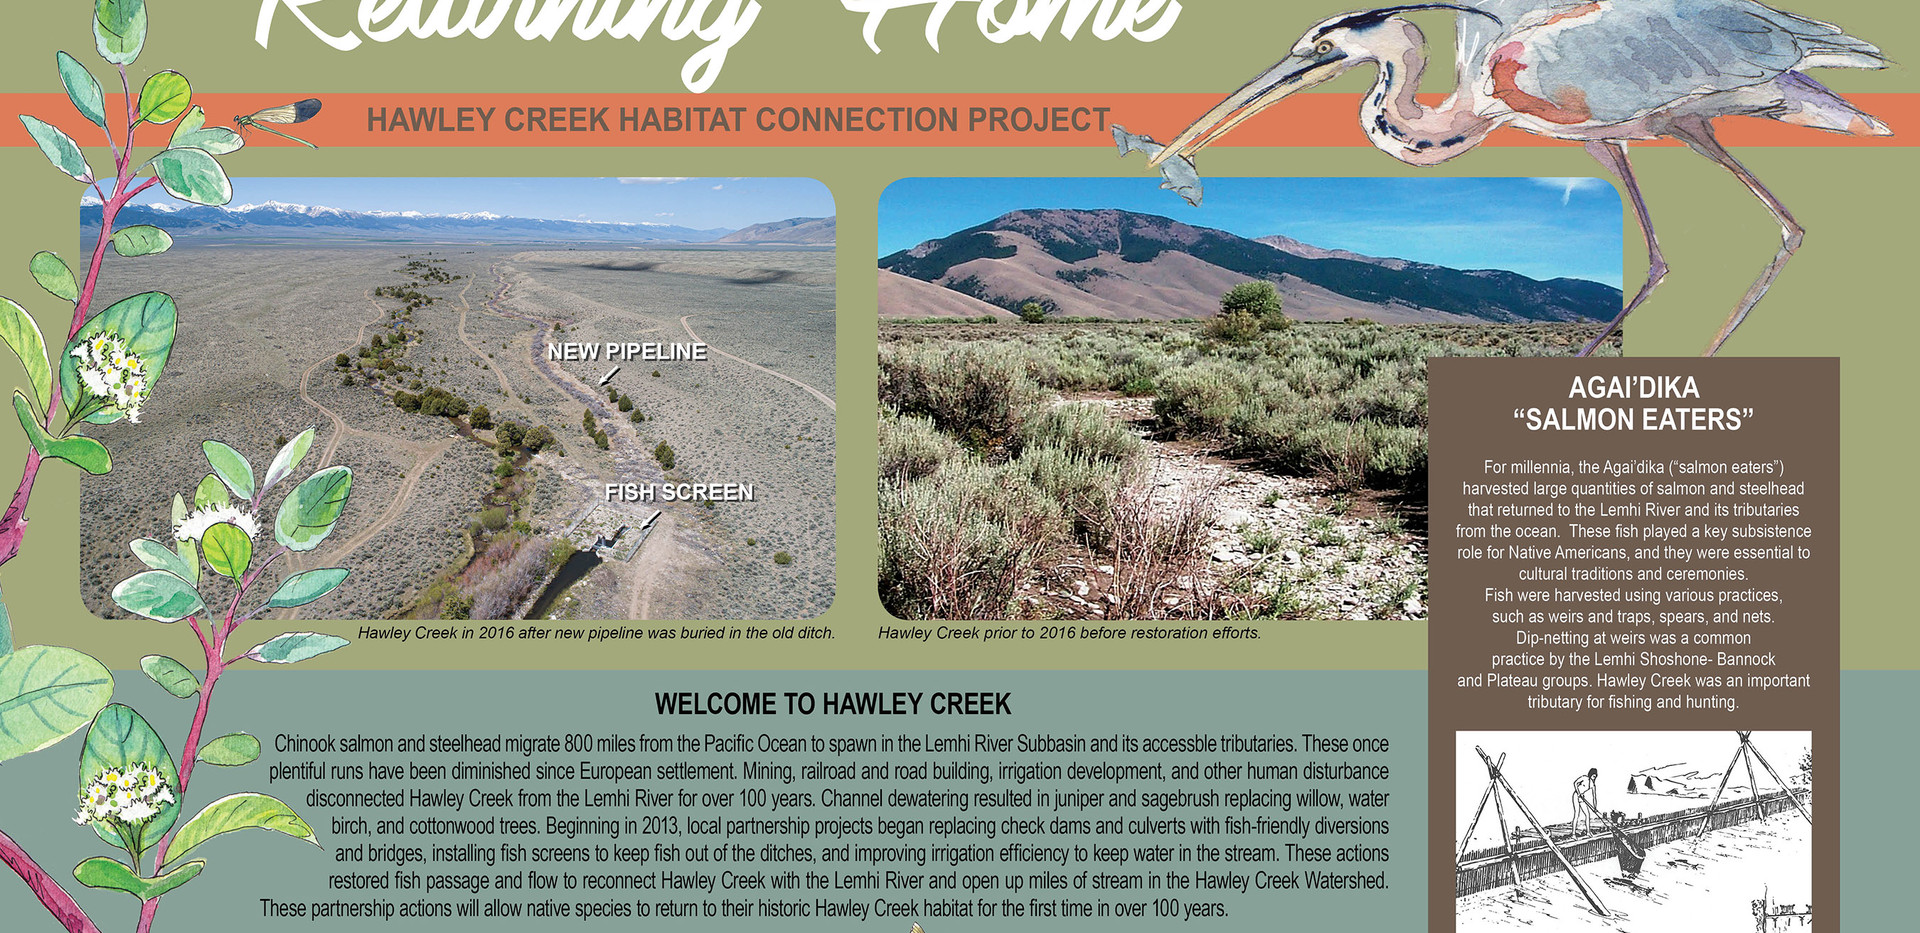 Hawley Creek Kiosk 2019 - panel 2